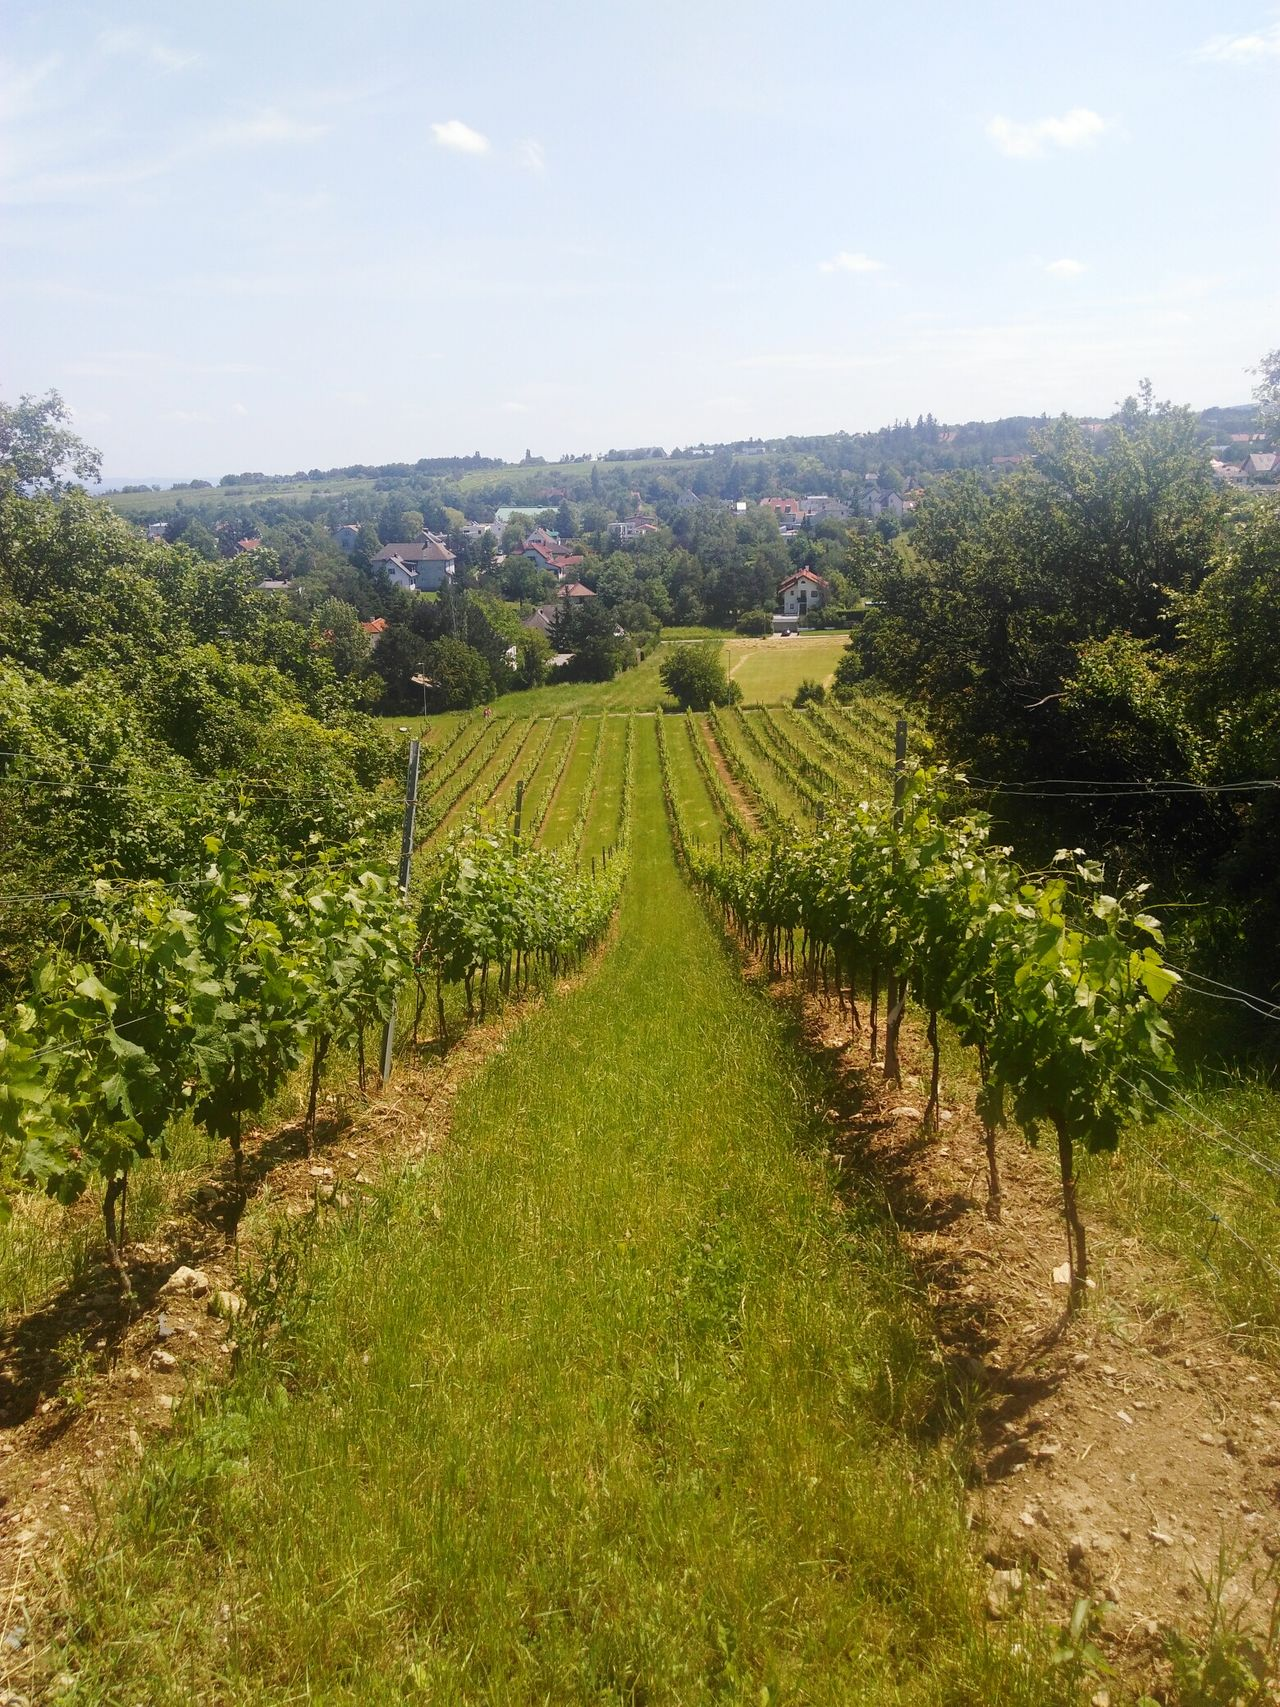 Agriculture Field Vineyard Growth Winemaking Wein Wine Grape Landscape Fruit Austria Perchtoldsdorf